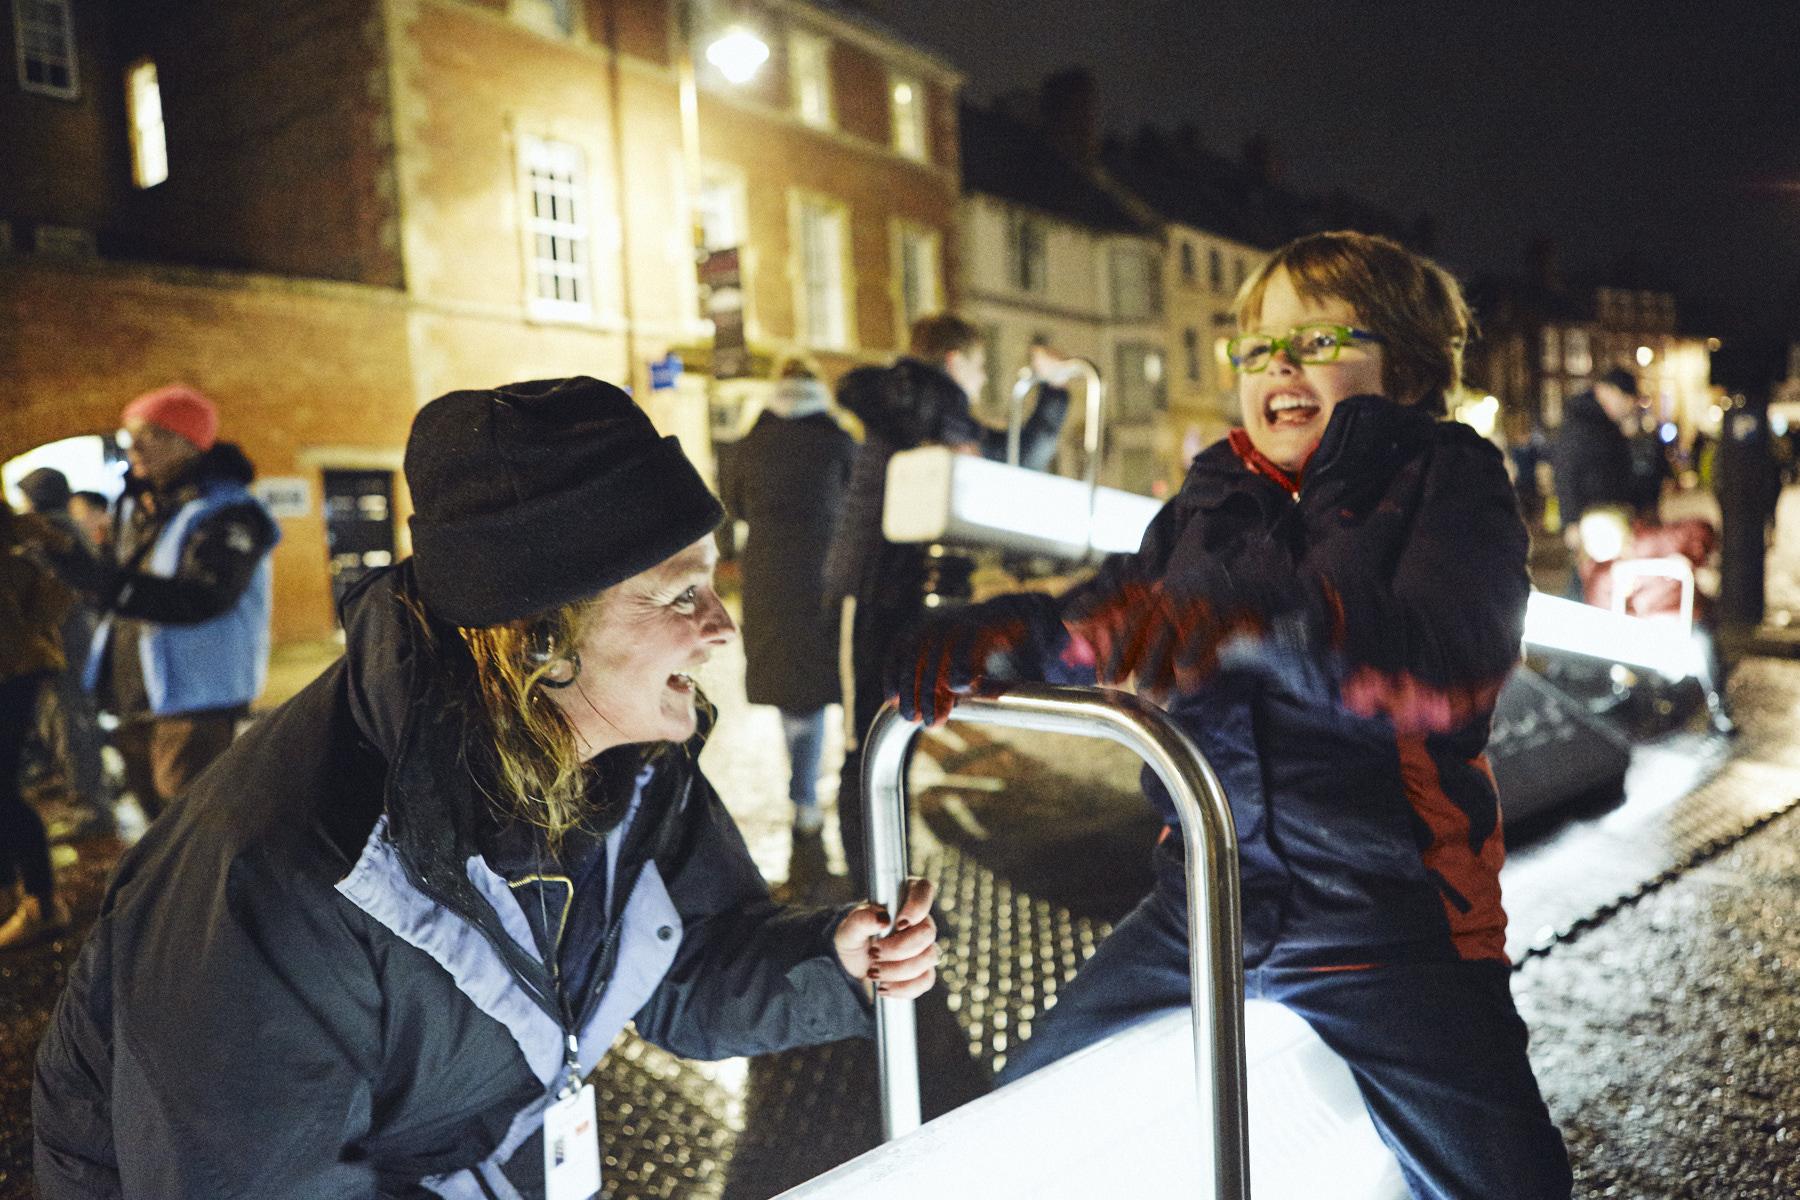 Kate Harvey interacting with illuminated seesaws